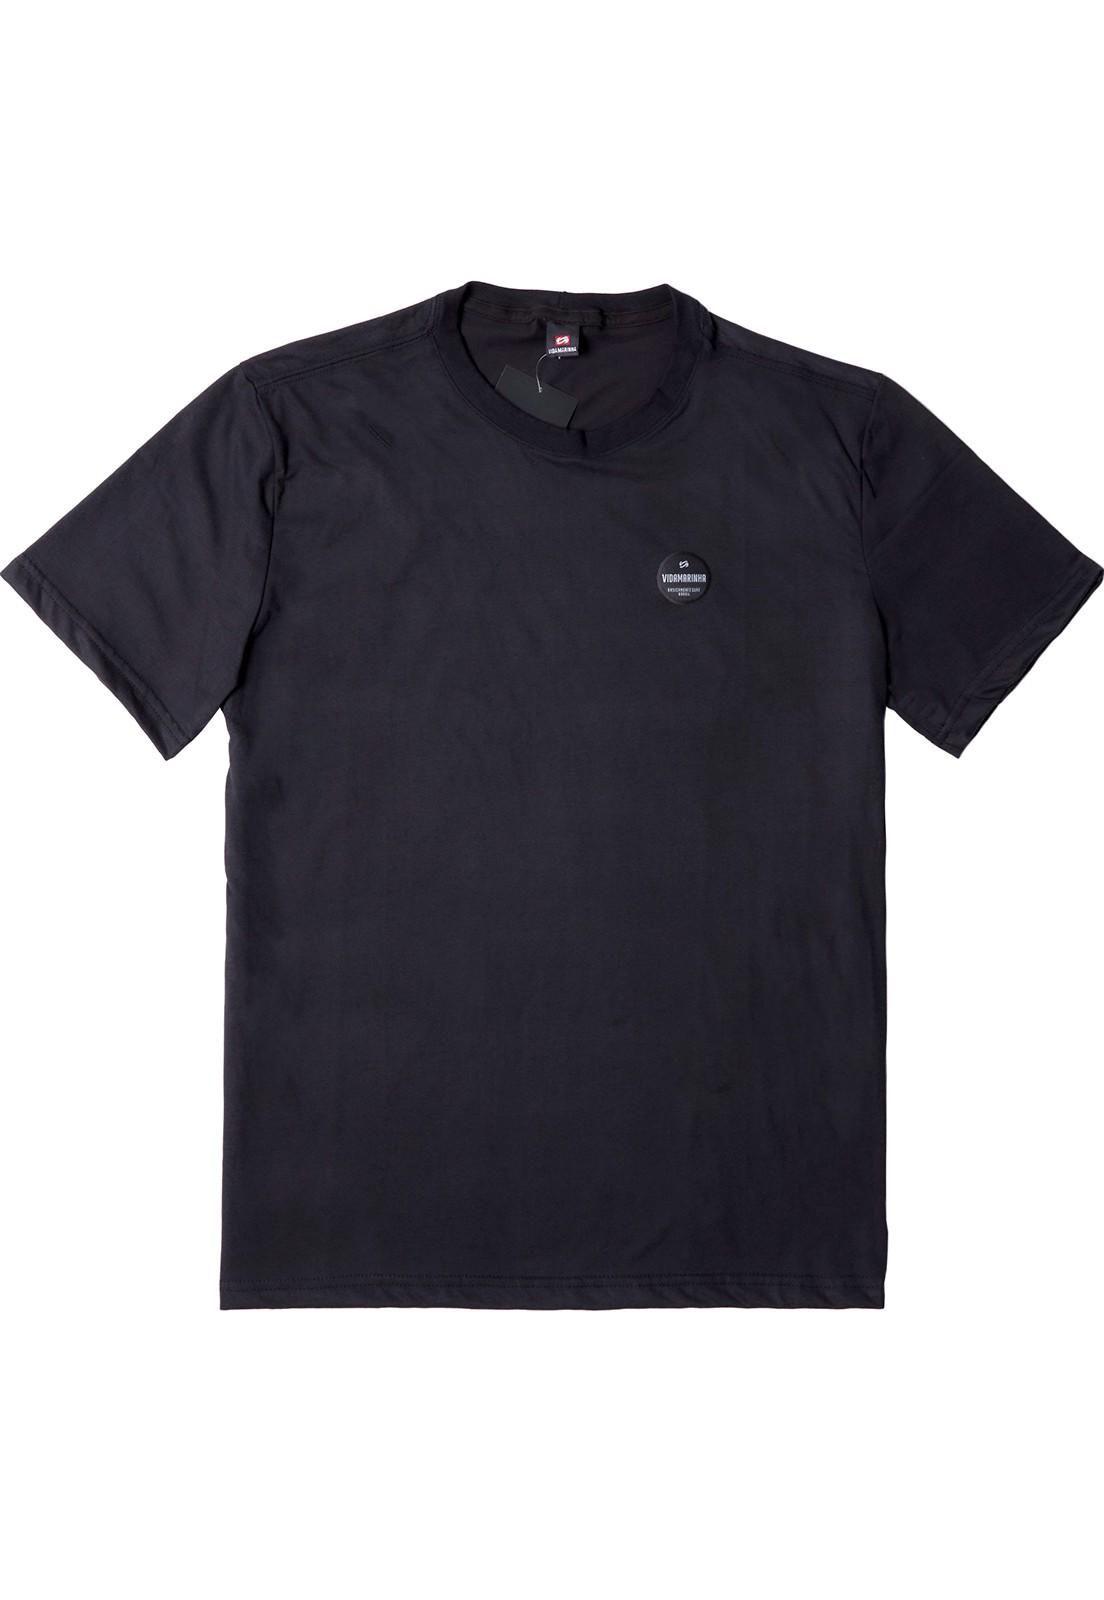 Camiseta Vida Marinha Manga Curta Básica Preto